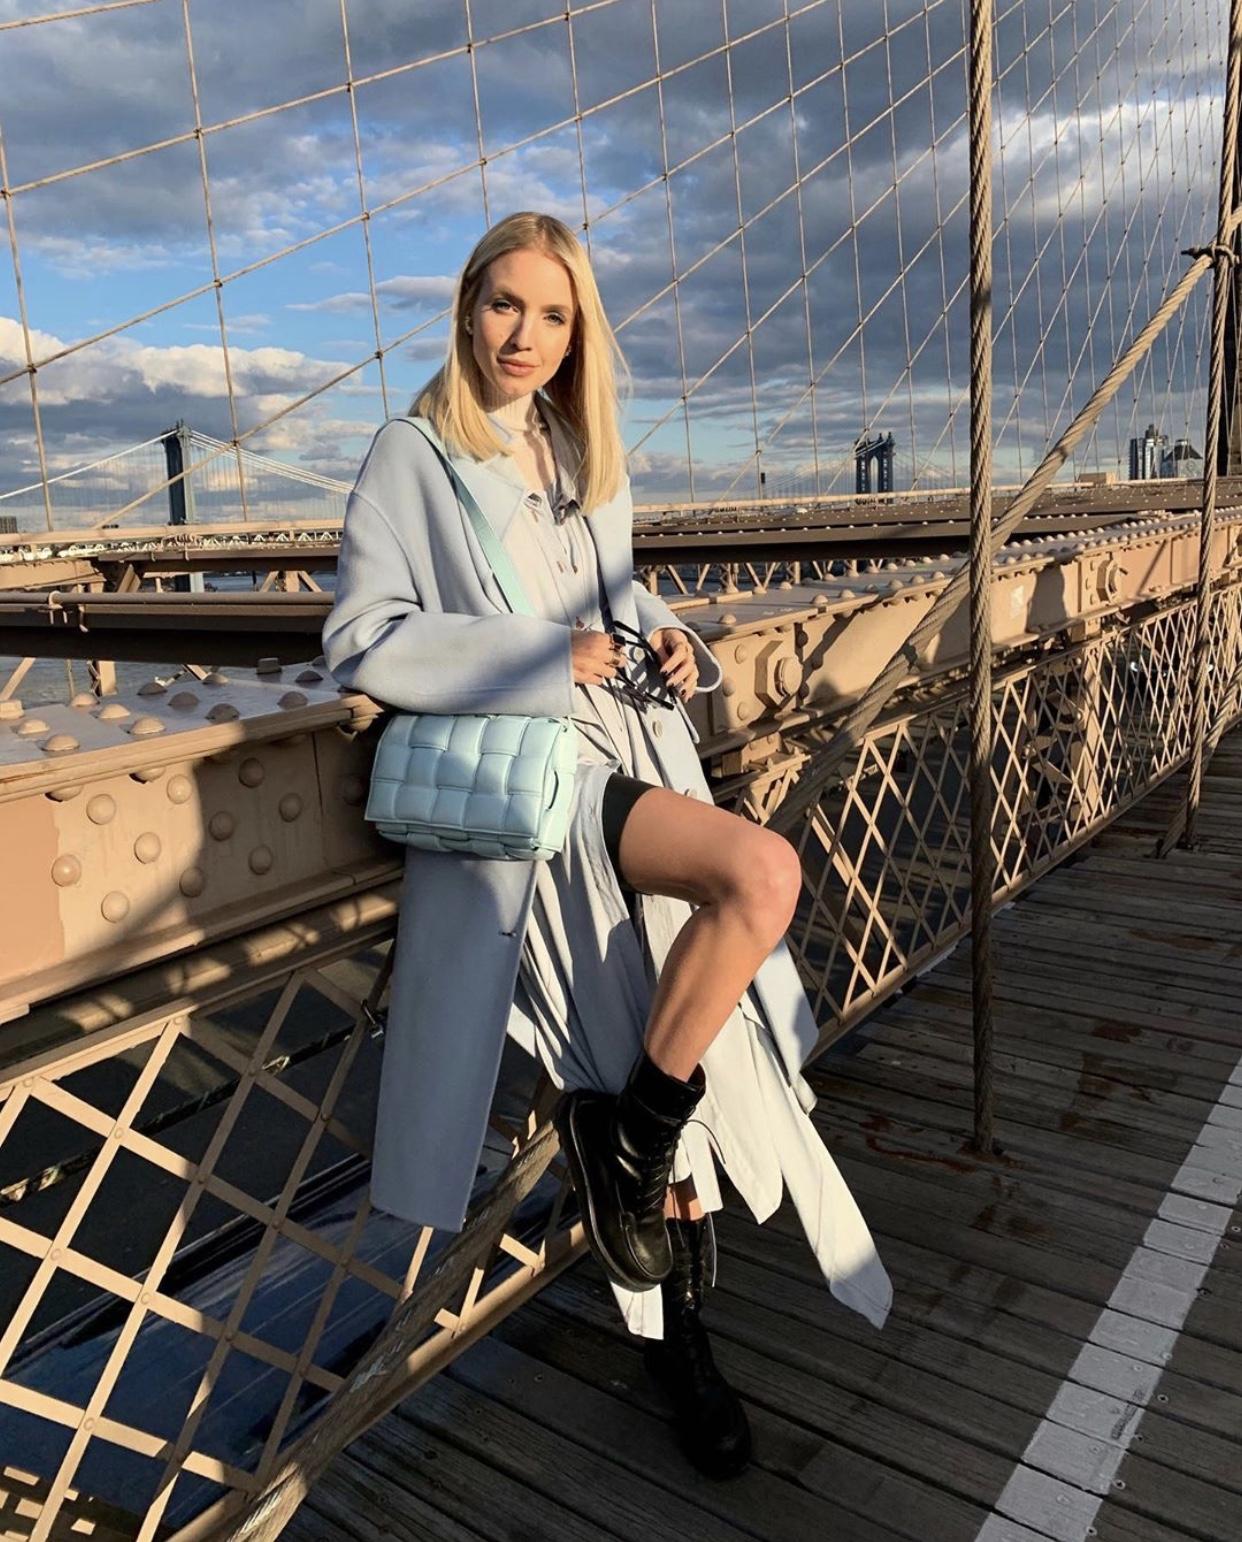 Leonie Hanne Bottega blue Cassette bag in NYC